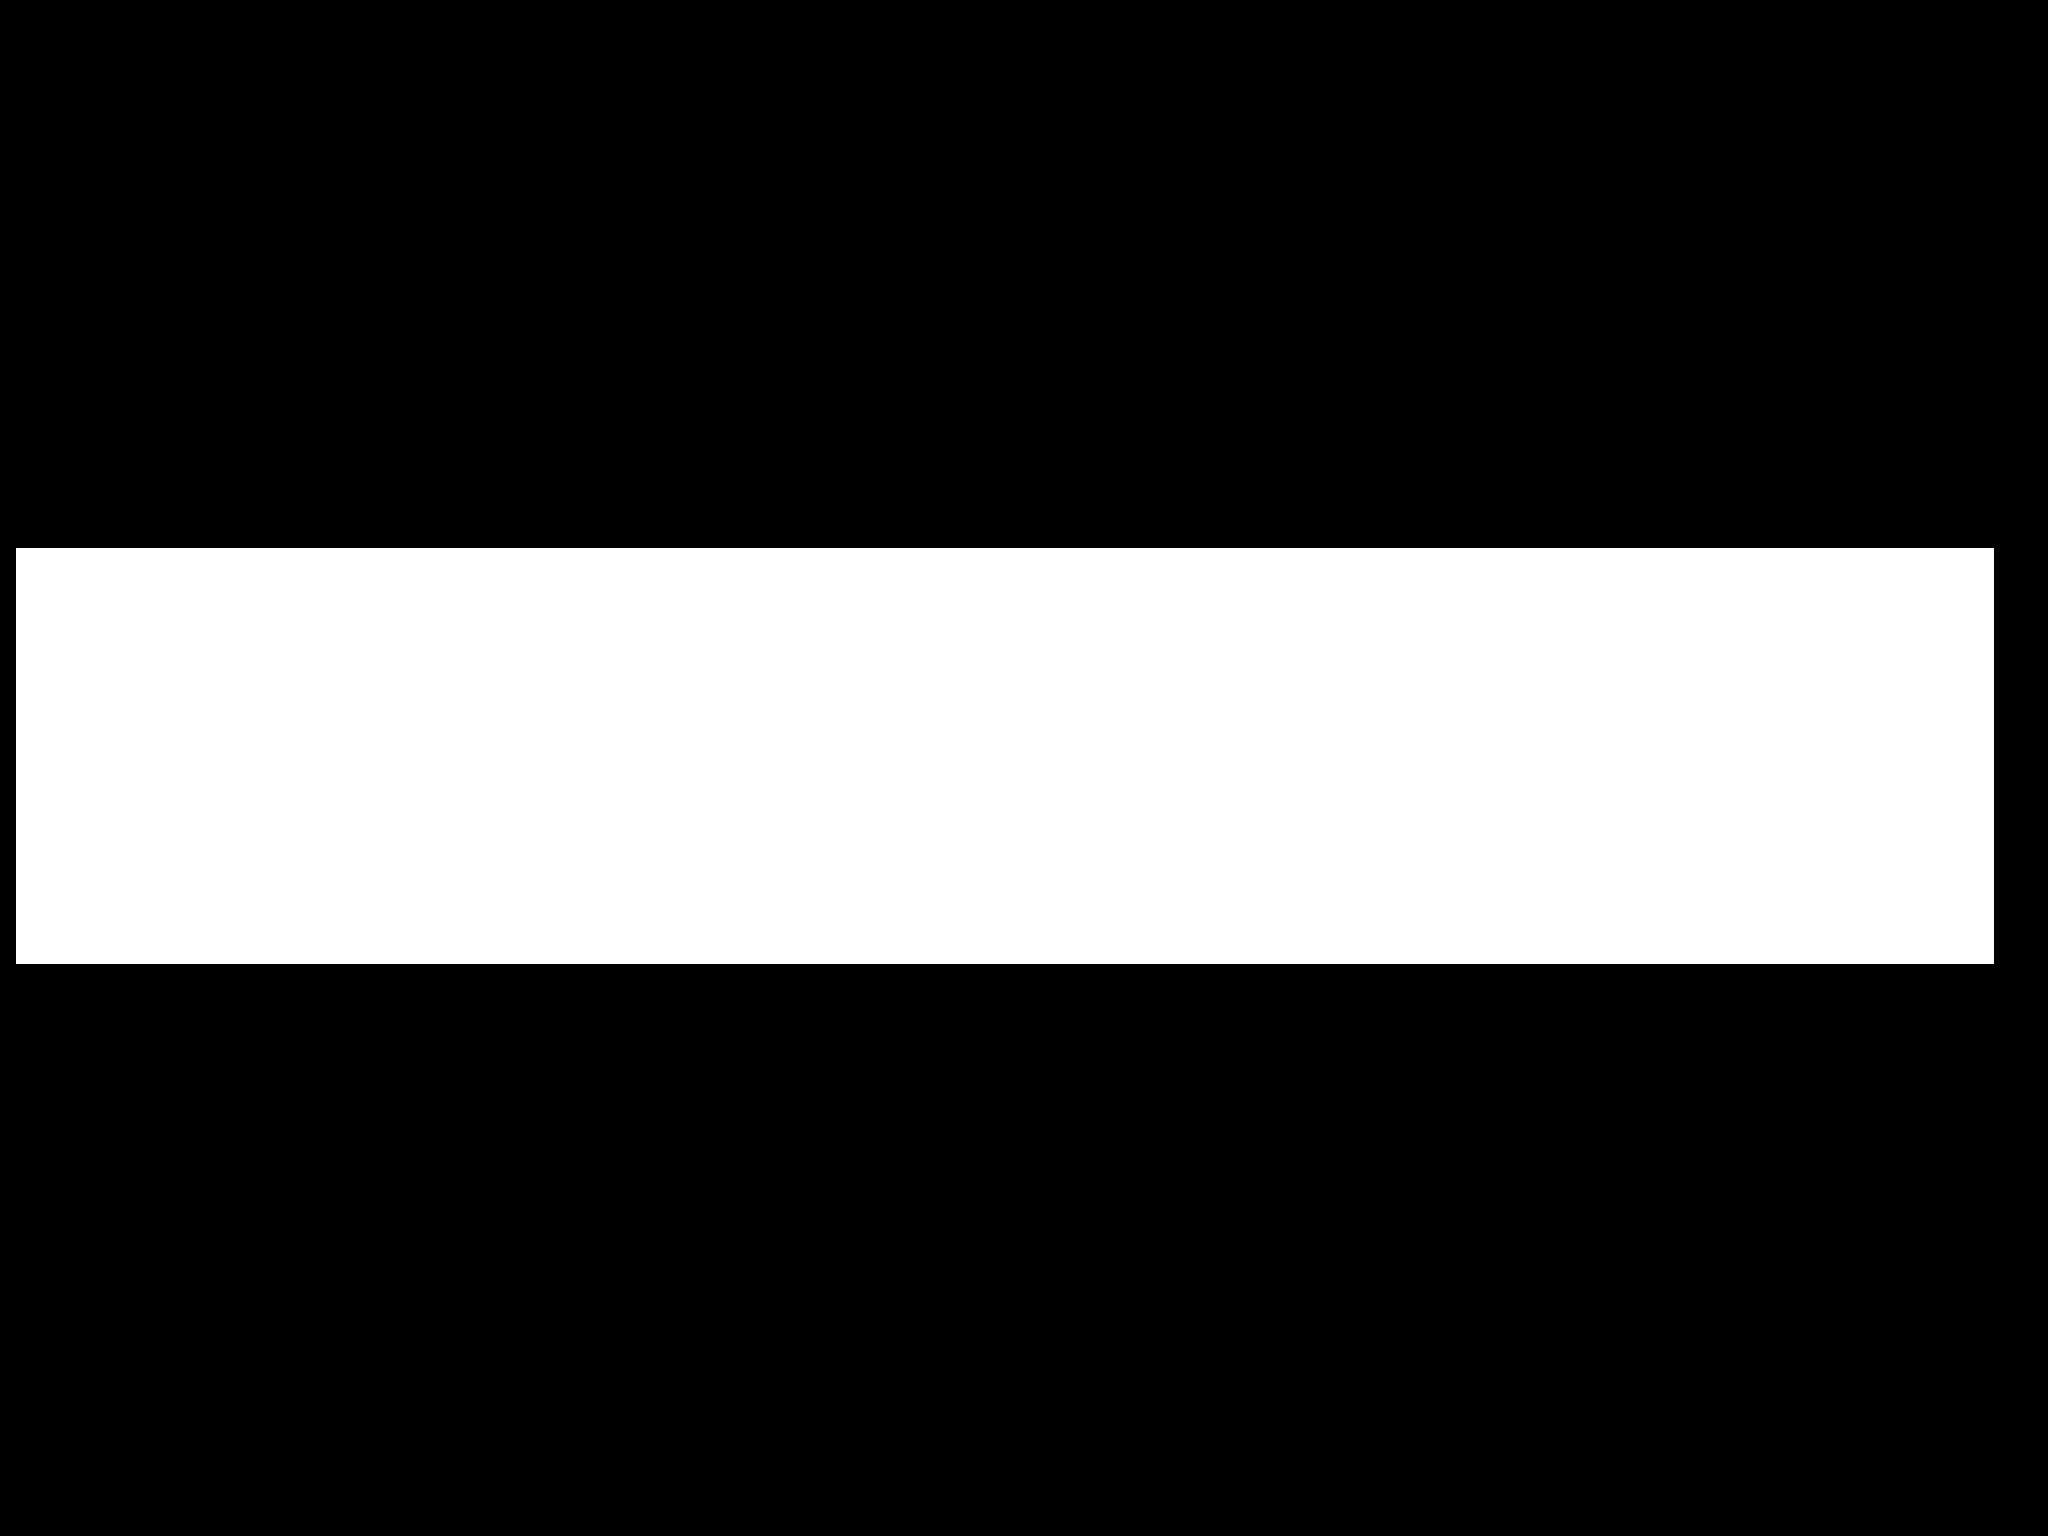 Cushman-&-Wakefield-logo (1).png